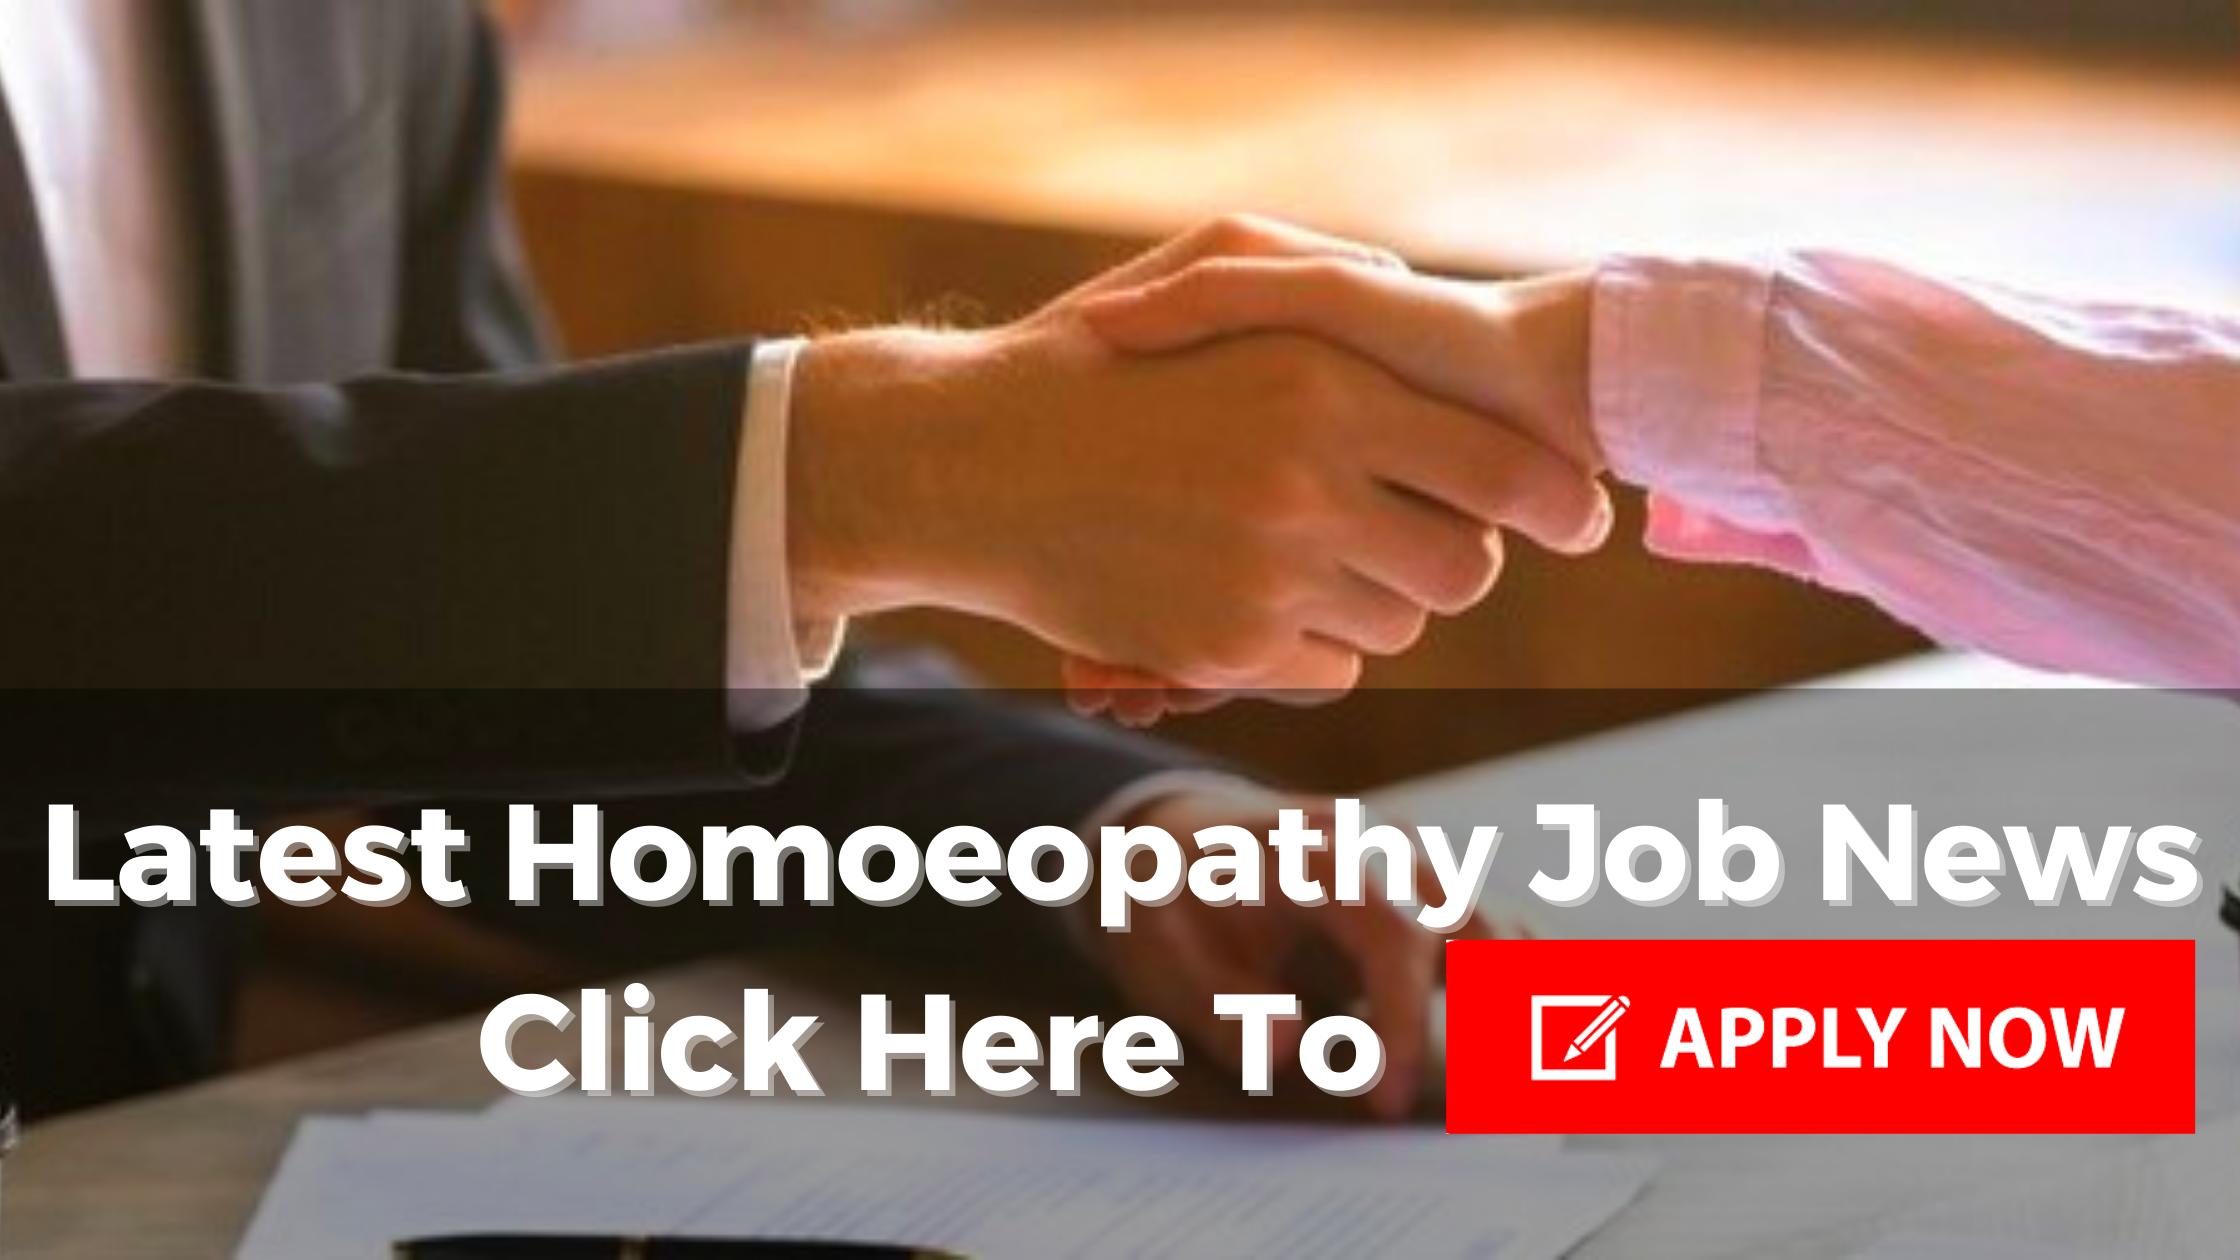 Latest_Homoeopathy_Jobs_News